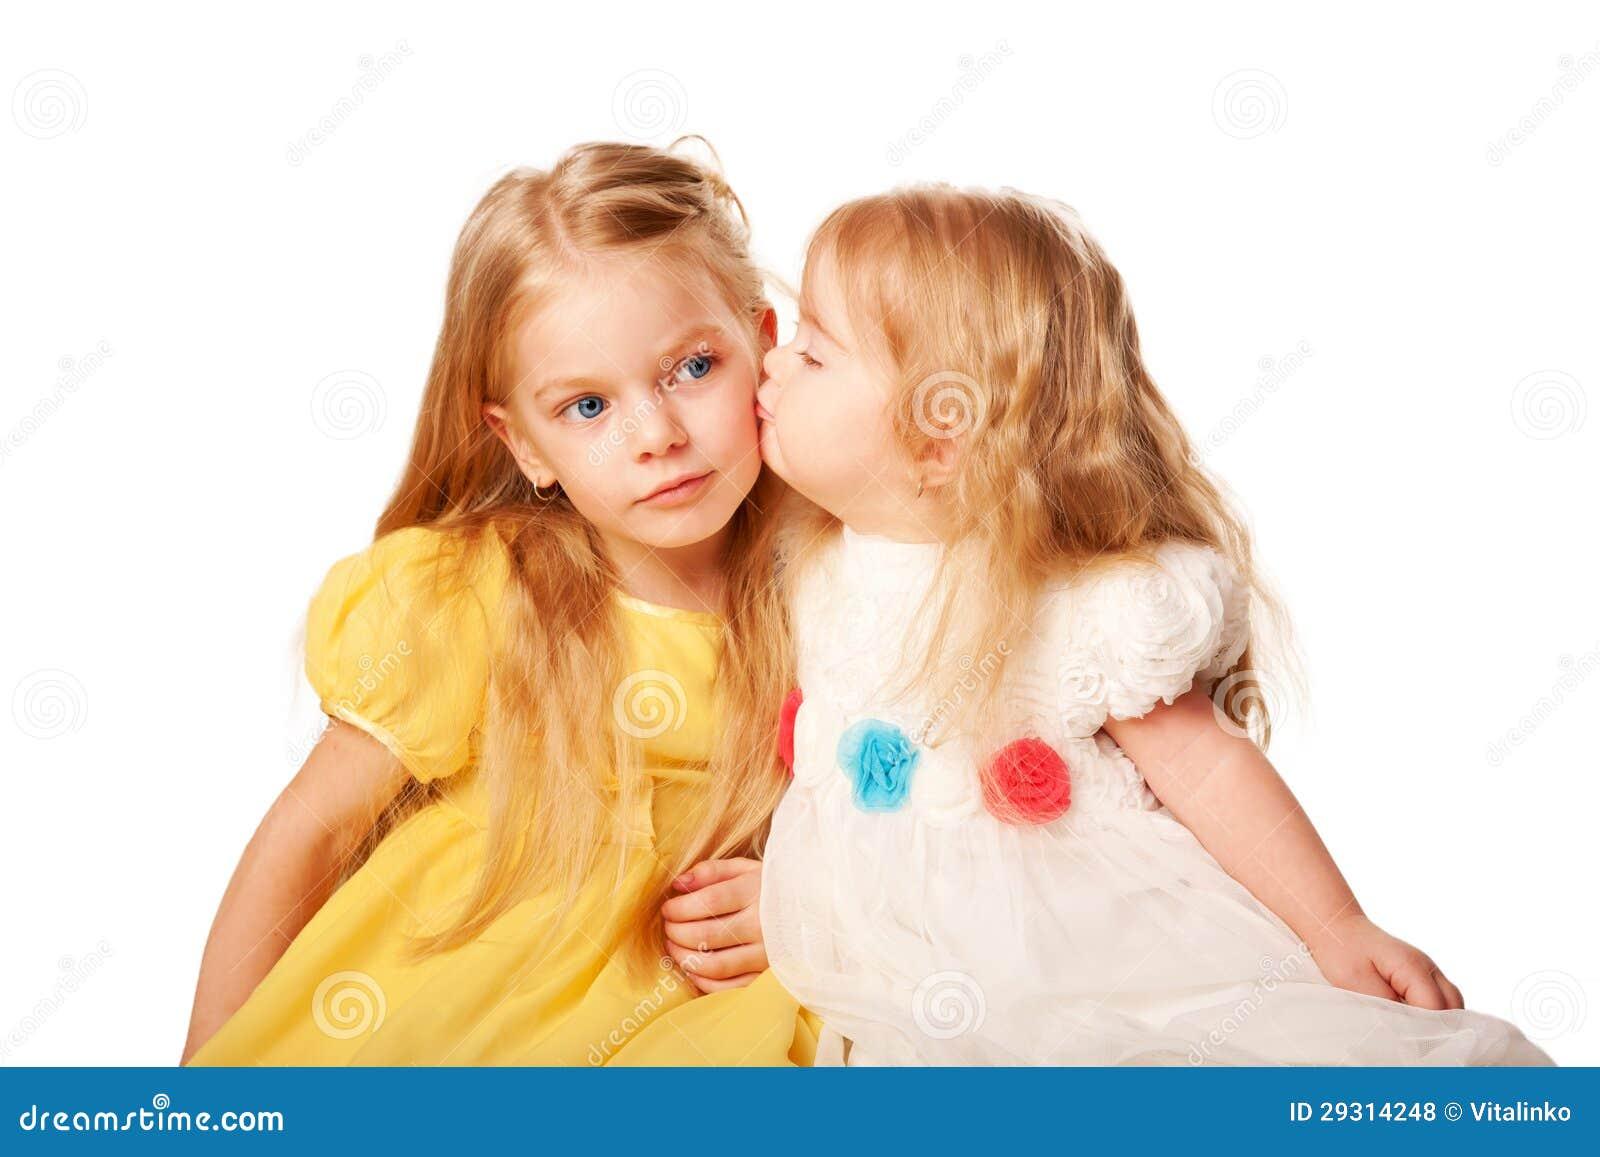 Frases para una Hermana - Gran Abundancia